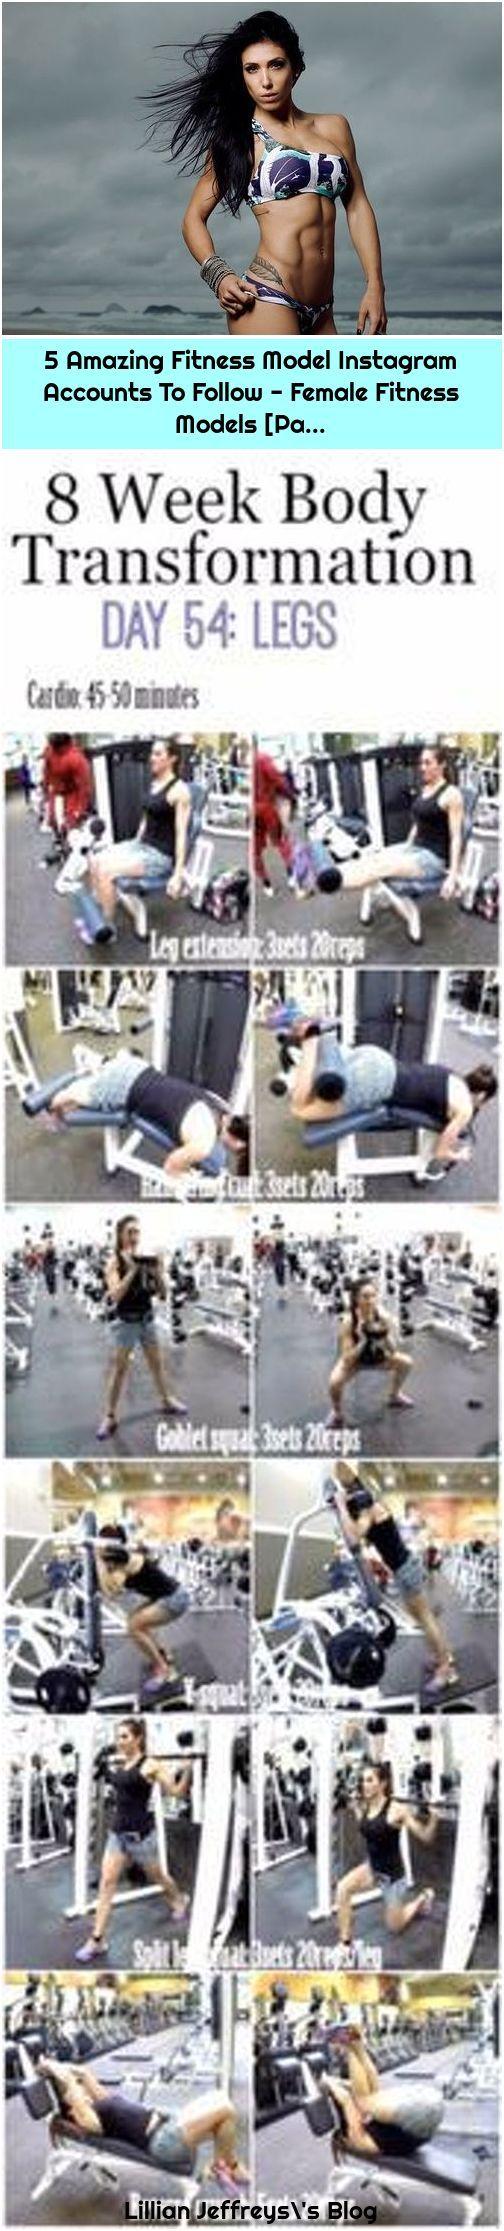 1. #befor #Fitness #Instagram #motivacin #super #instagram #befor #Fitness #Instagram #motivacin #su...